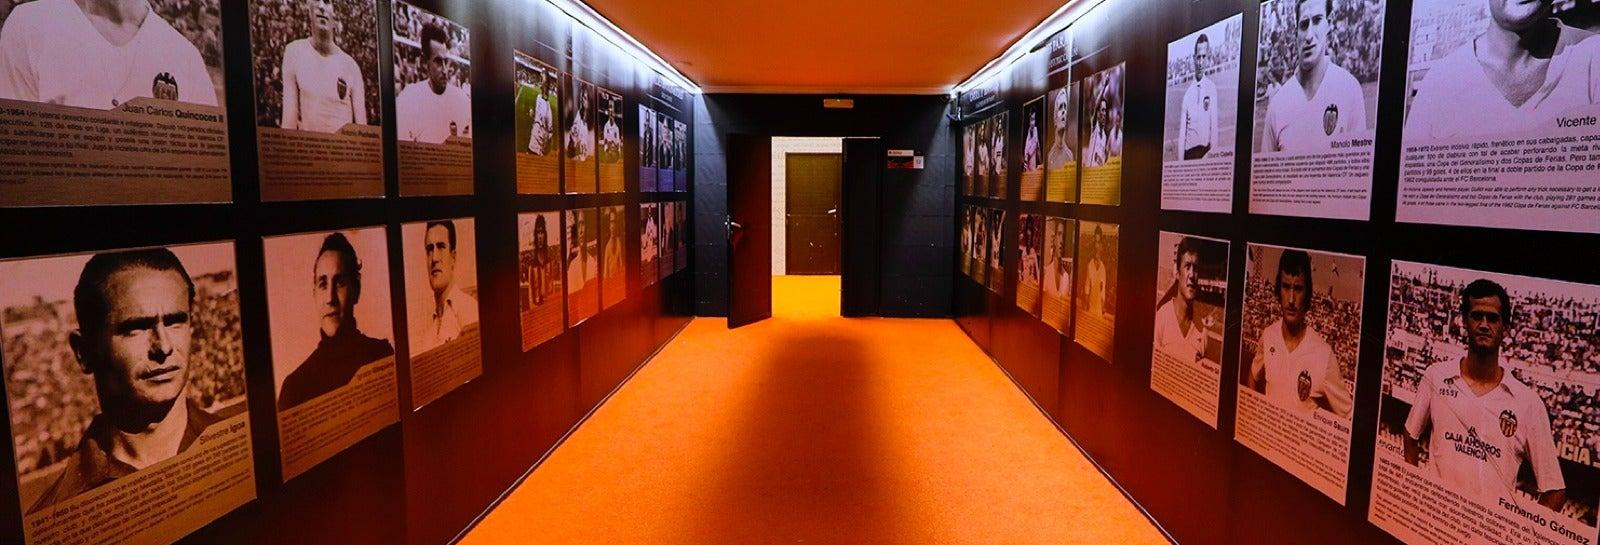 Tour dello stadio Mestalla